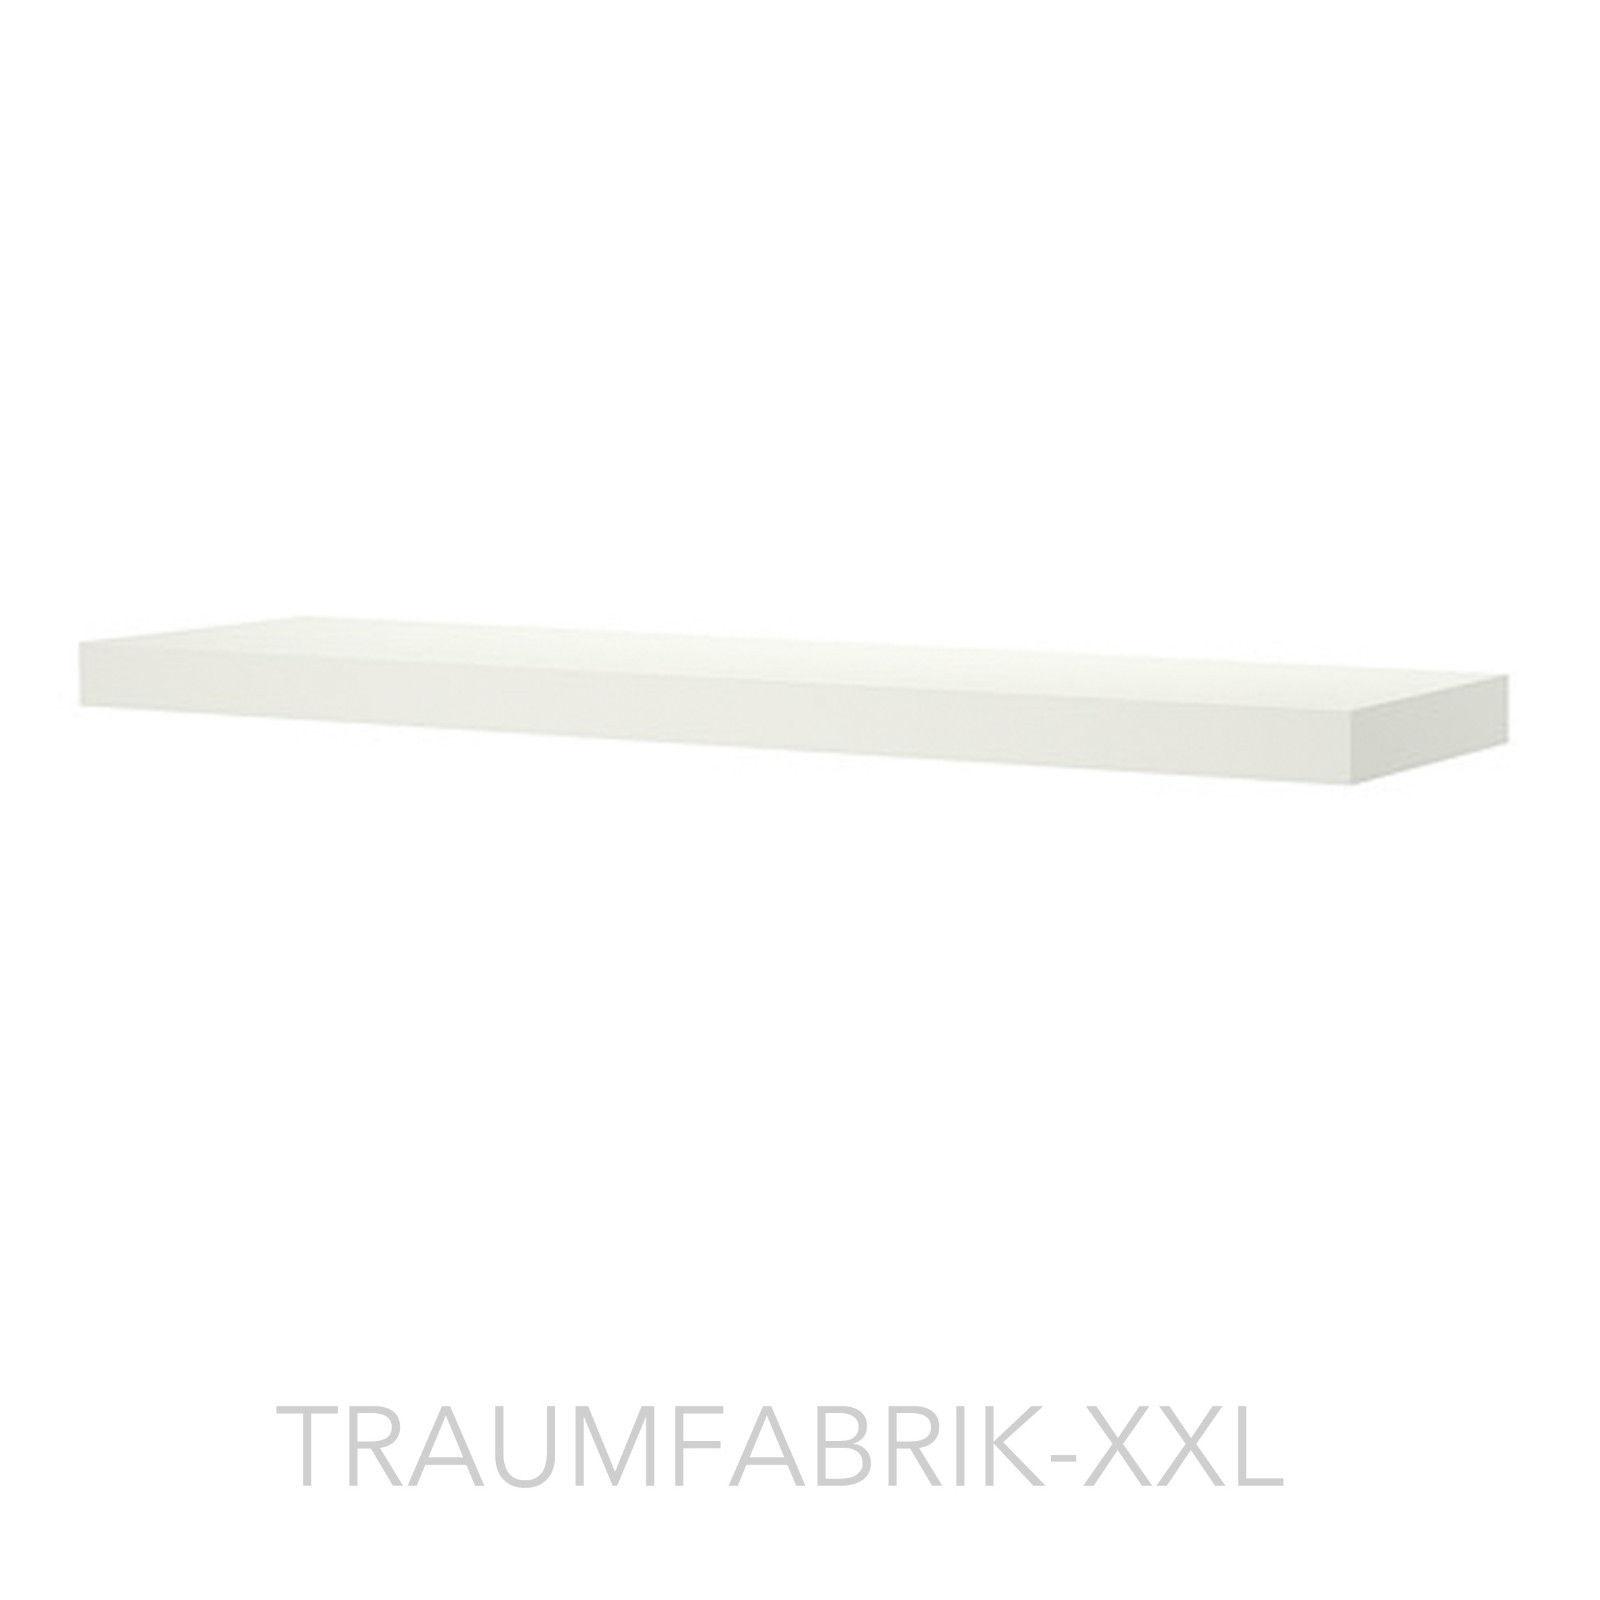 ikea designer wandregal 110 26 cm regal wei frei schwebend ablage lounge neu traumfabrik xxl. Black Bedroom Furniture Sets. Home Design Ideas